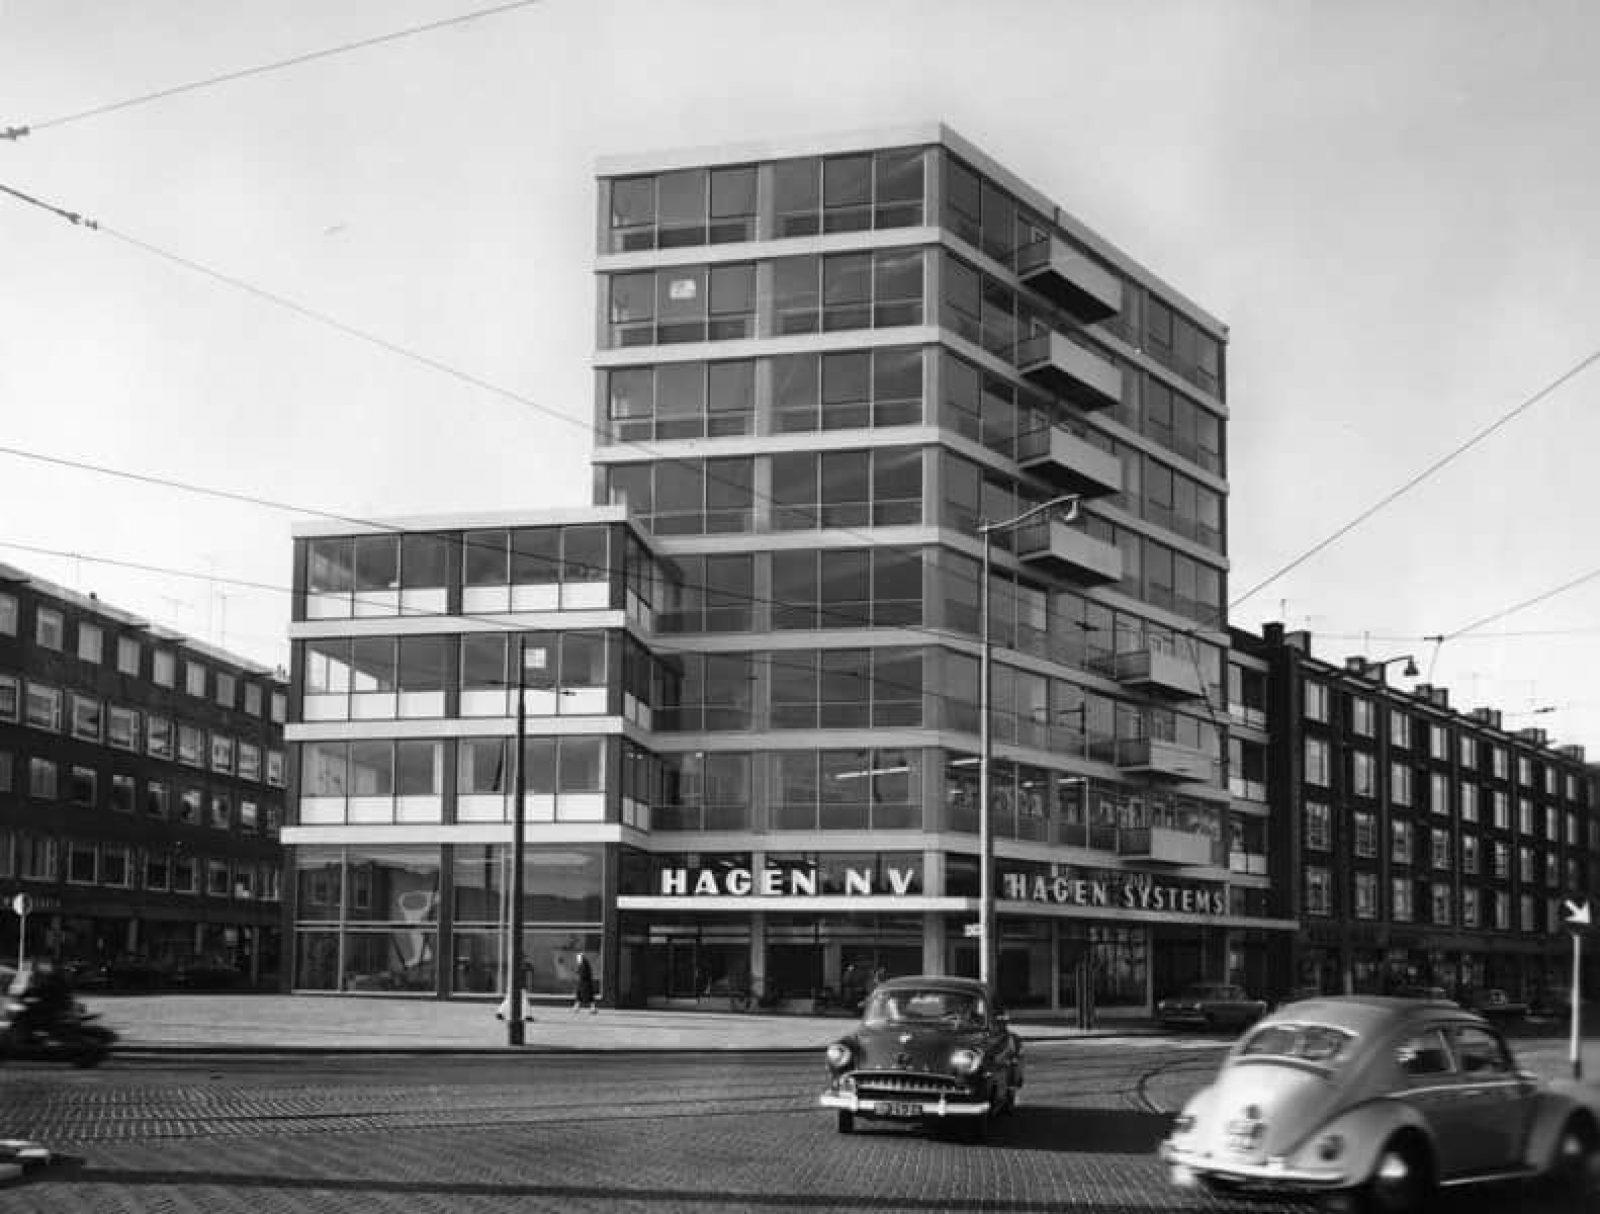 Stadsarchief Hoogkwartier Oostplein